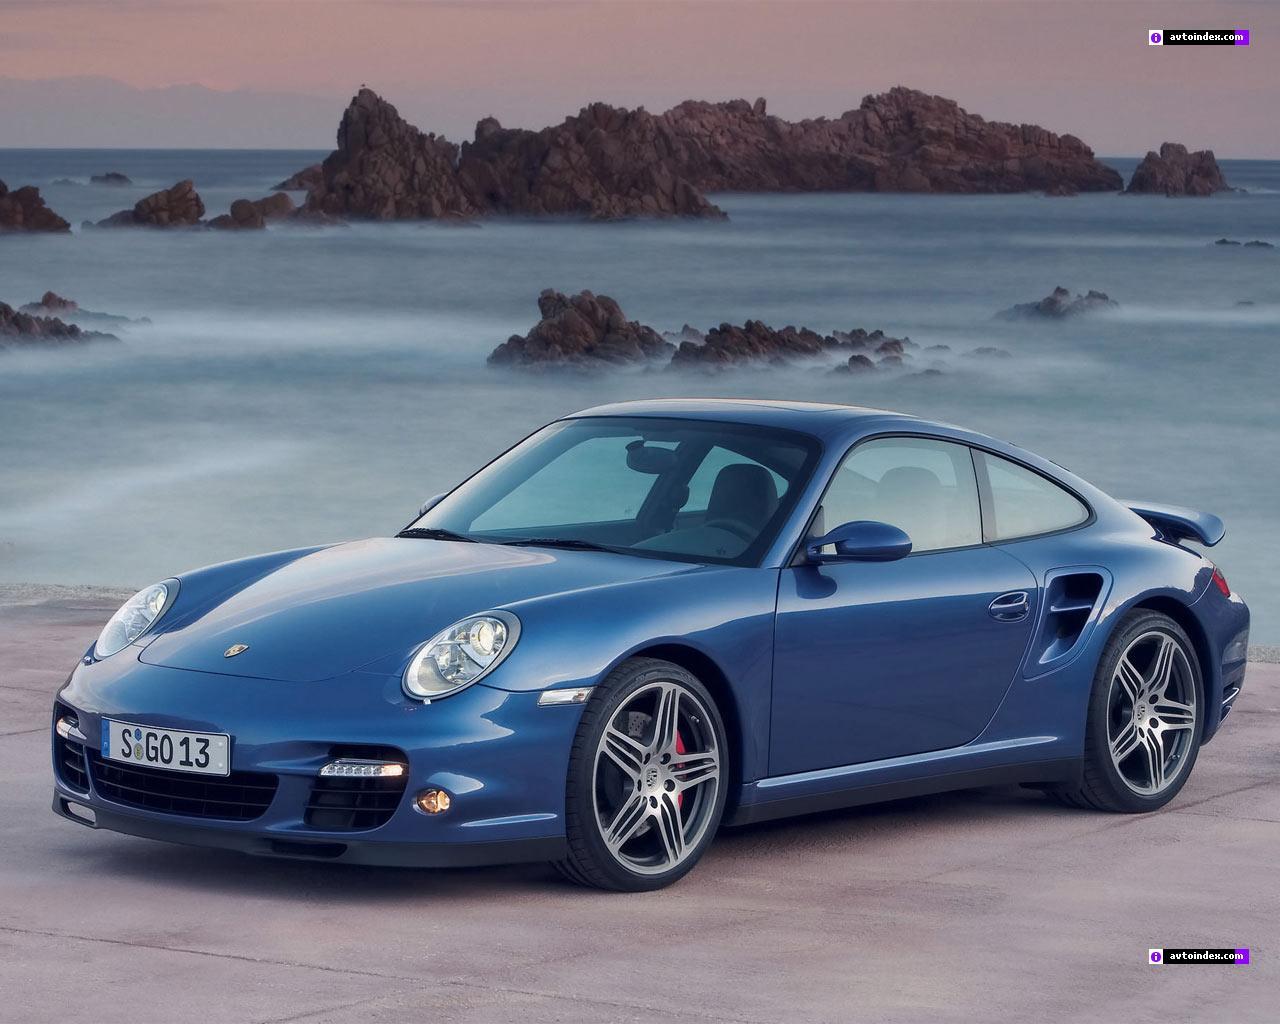 Porsche 911 pictures. Photo 2.